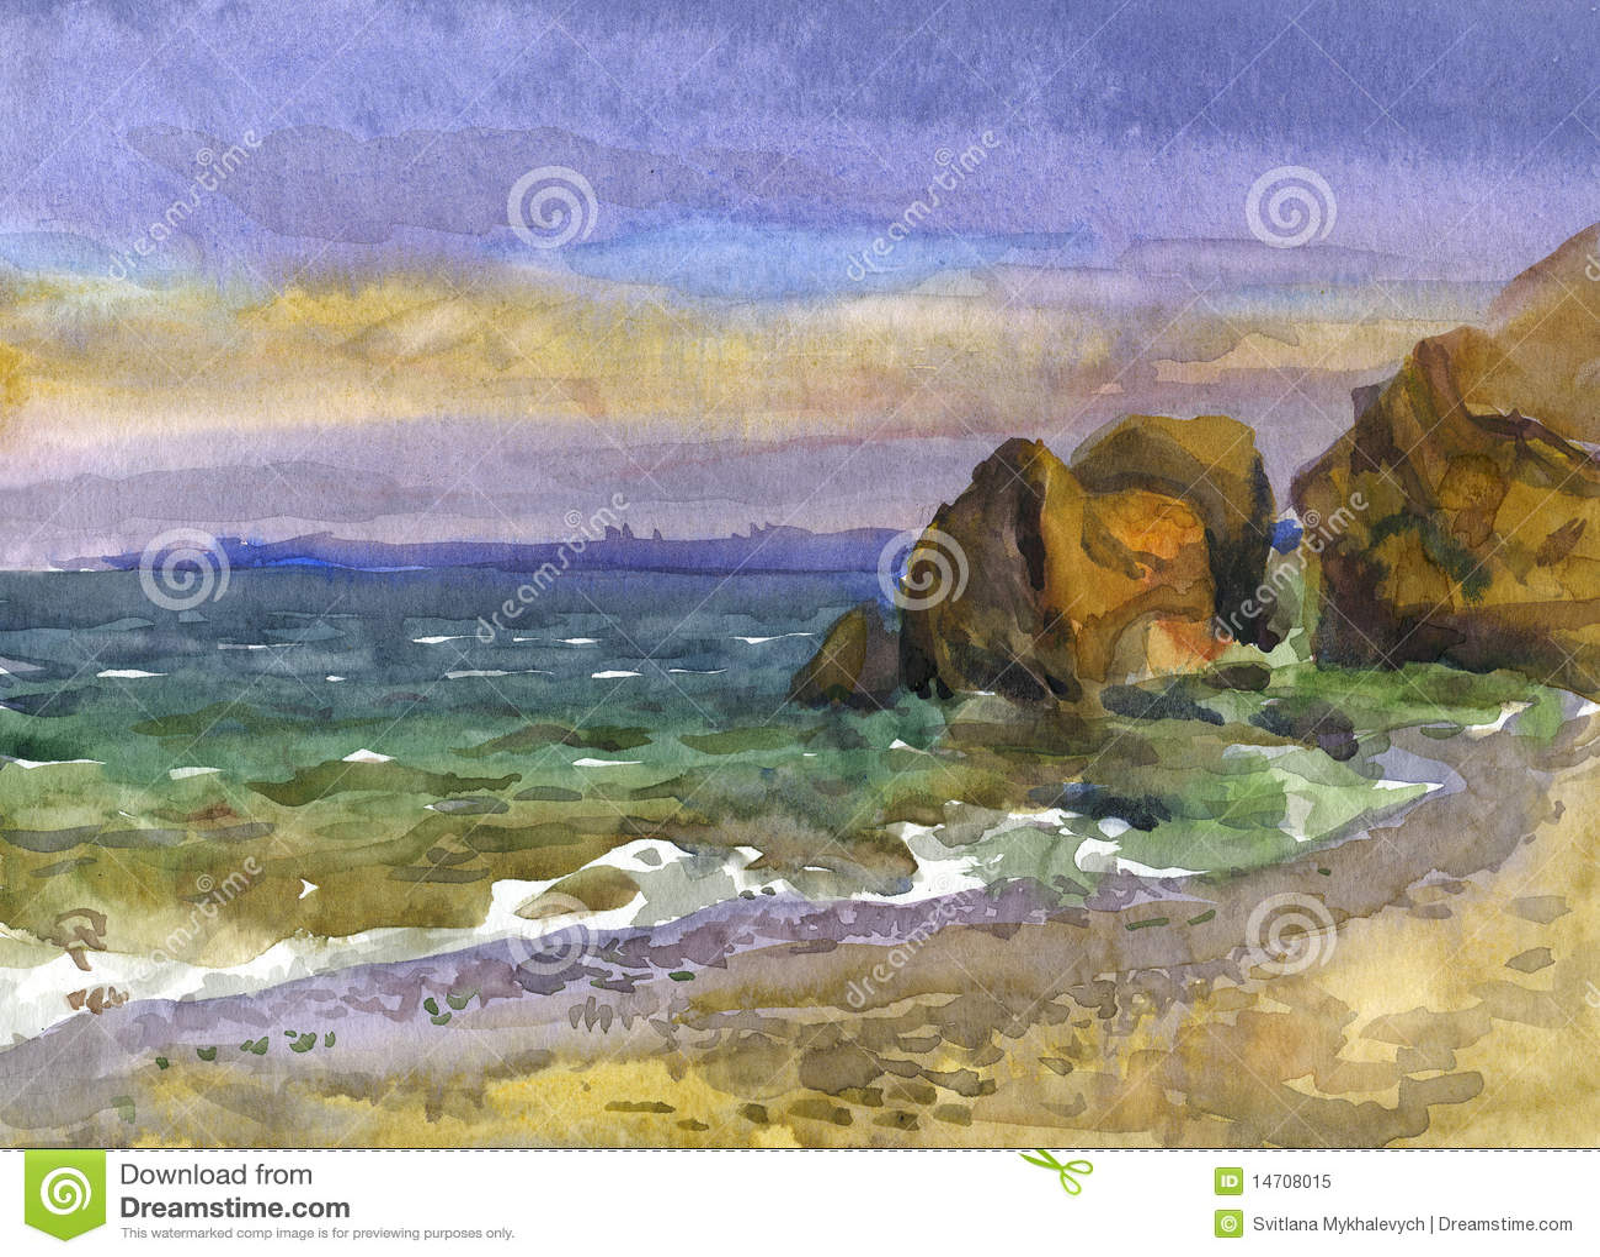 Sea sunset. Watercolor.